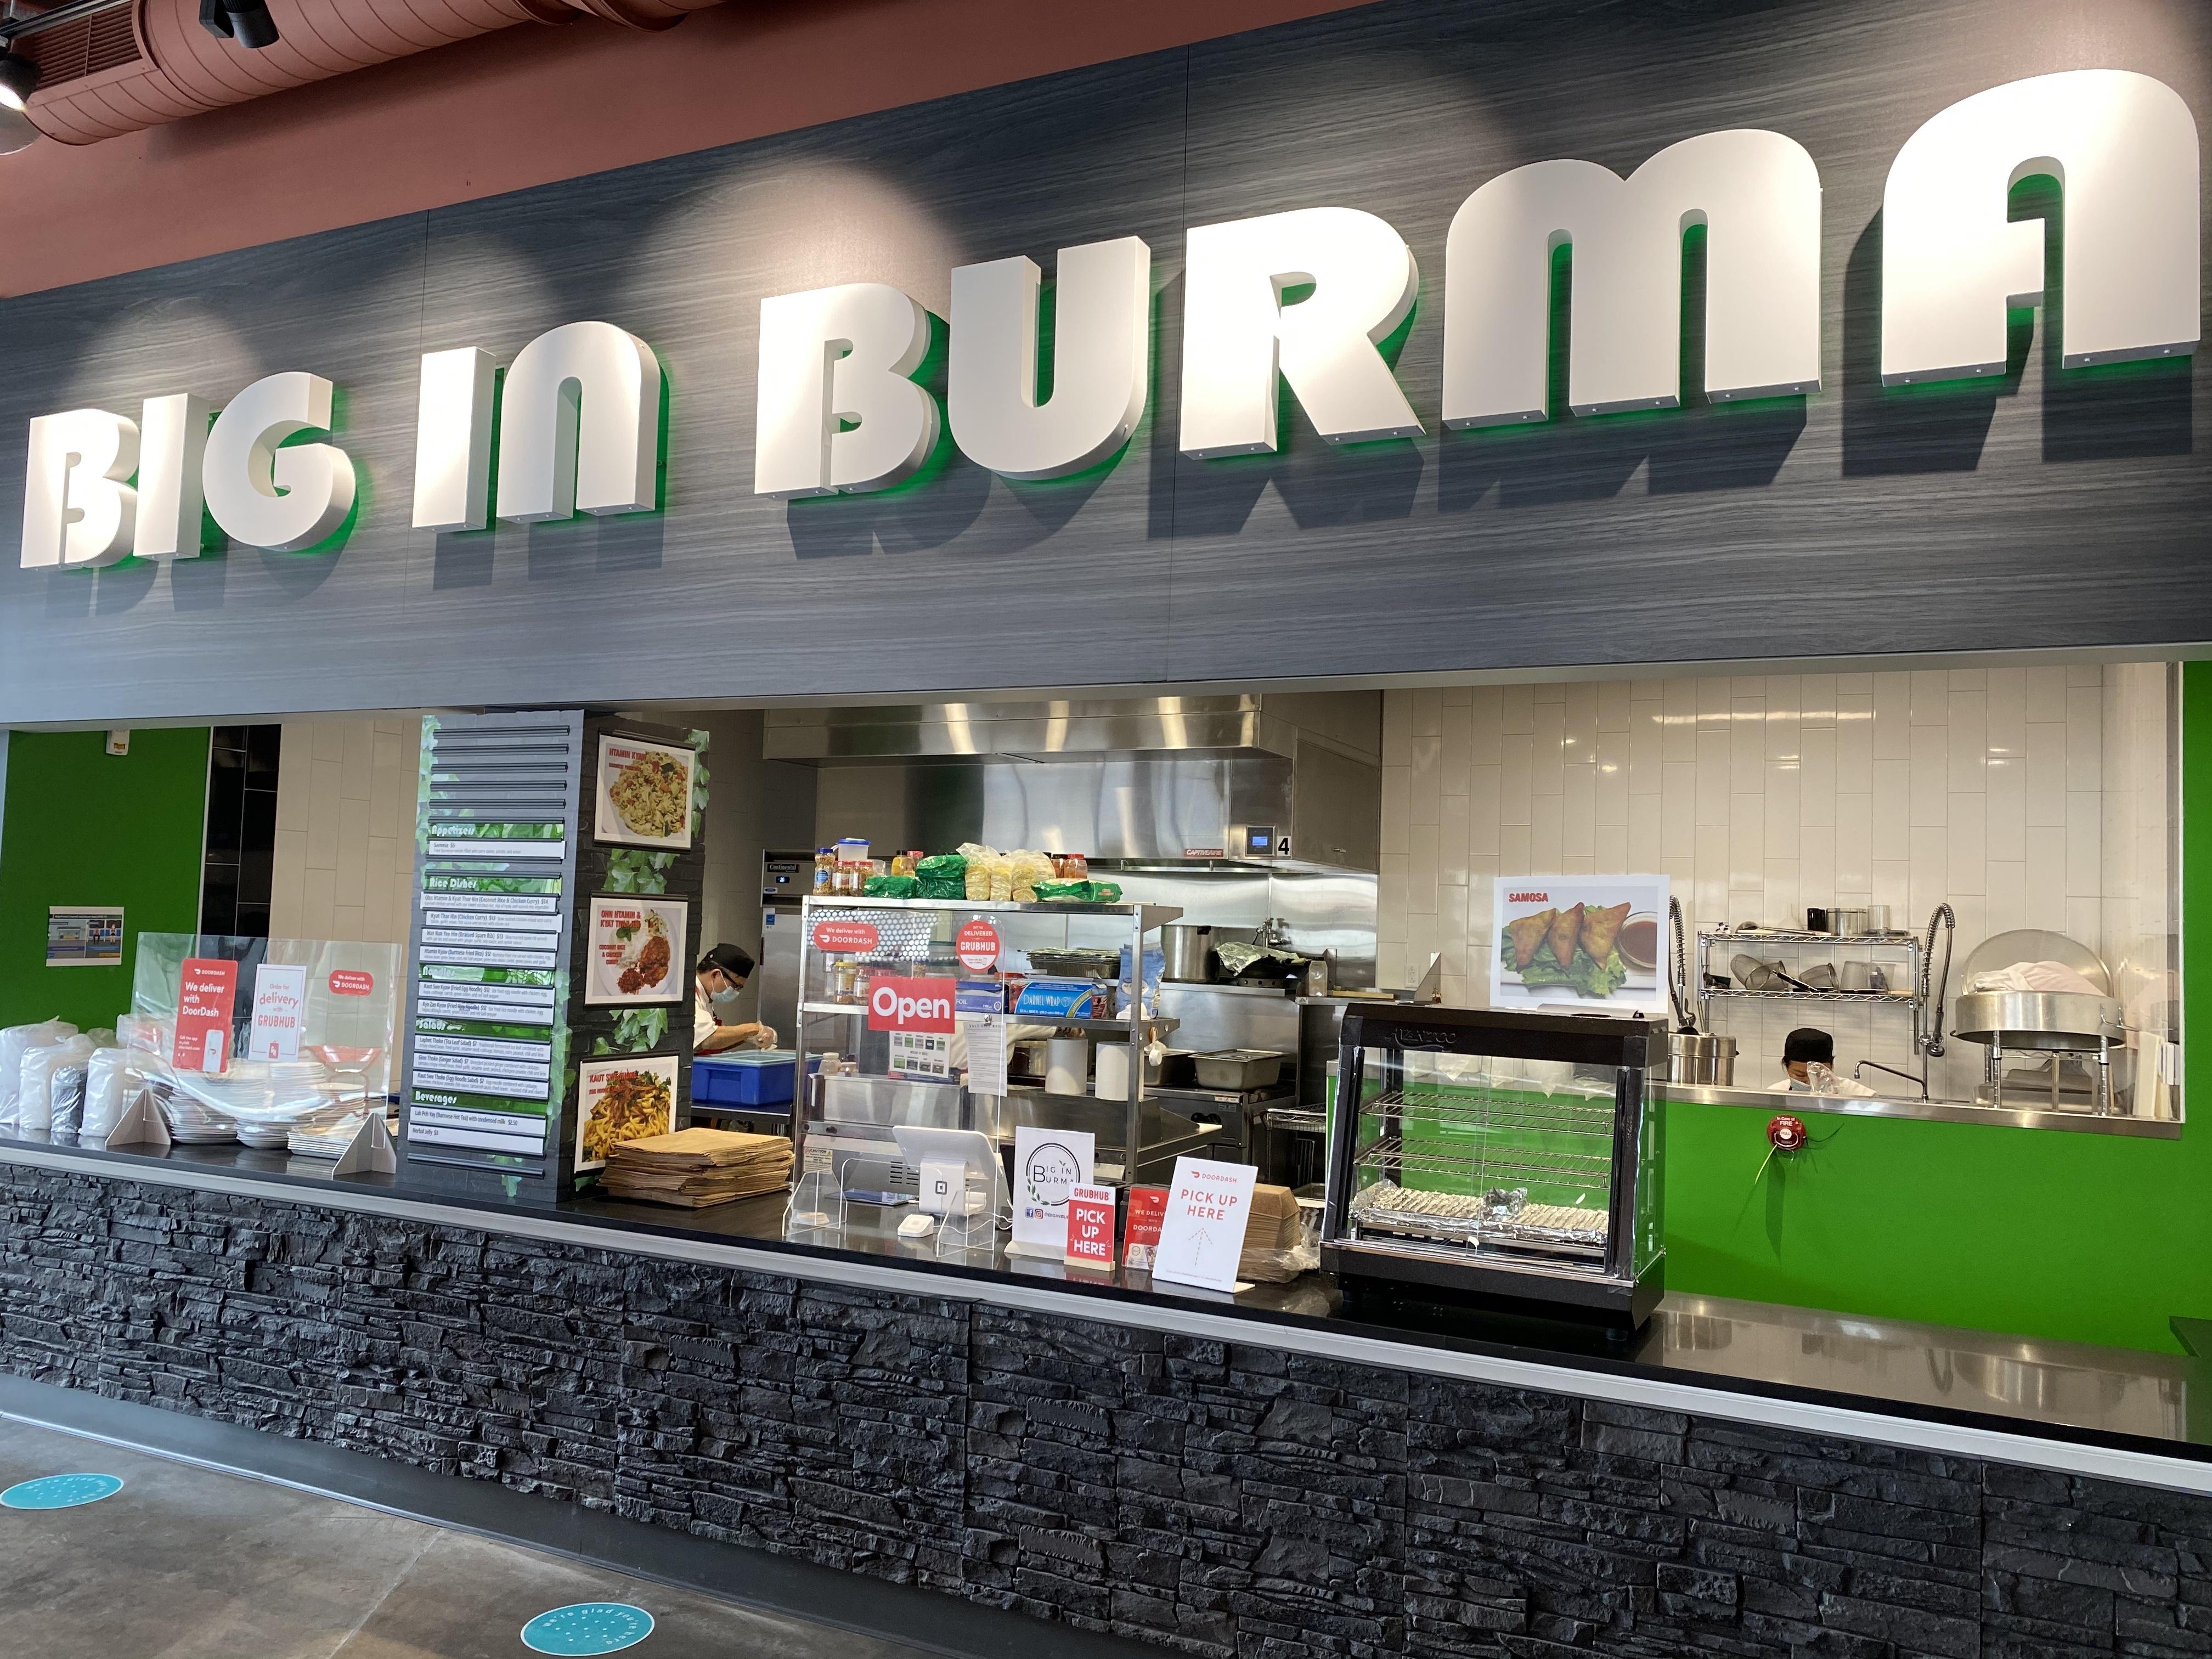 Big in Burma is a restaurant located in Salt City Market in Syracuse, New York.